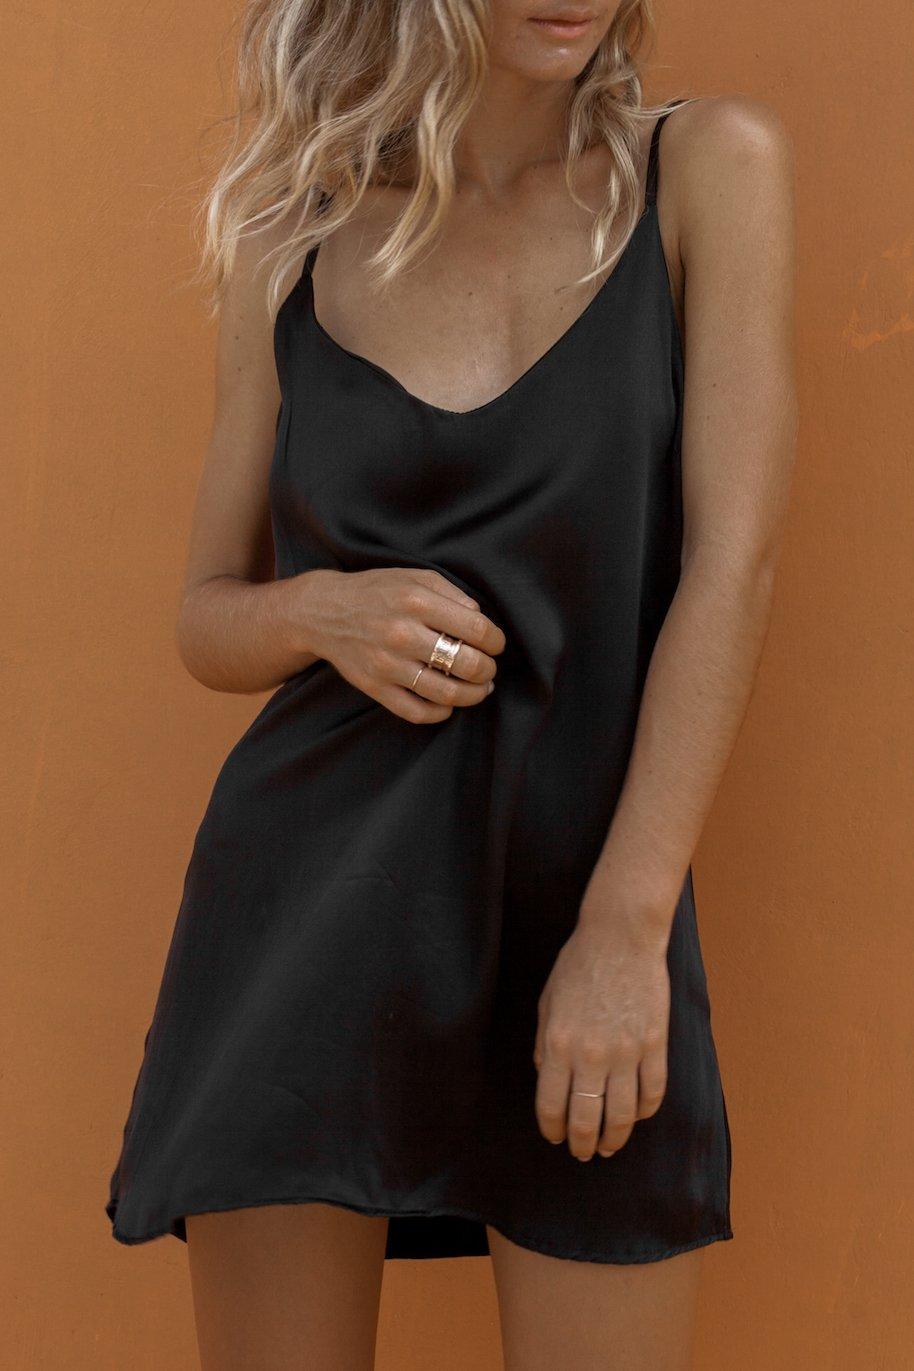 7. Posse - Alexa Dress - Image source and dress: here.